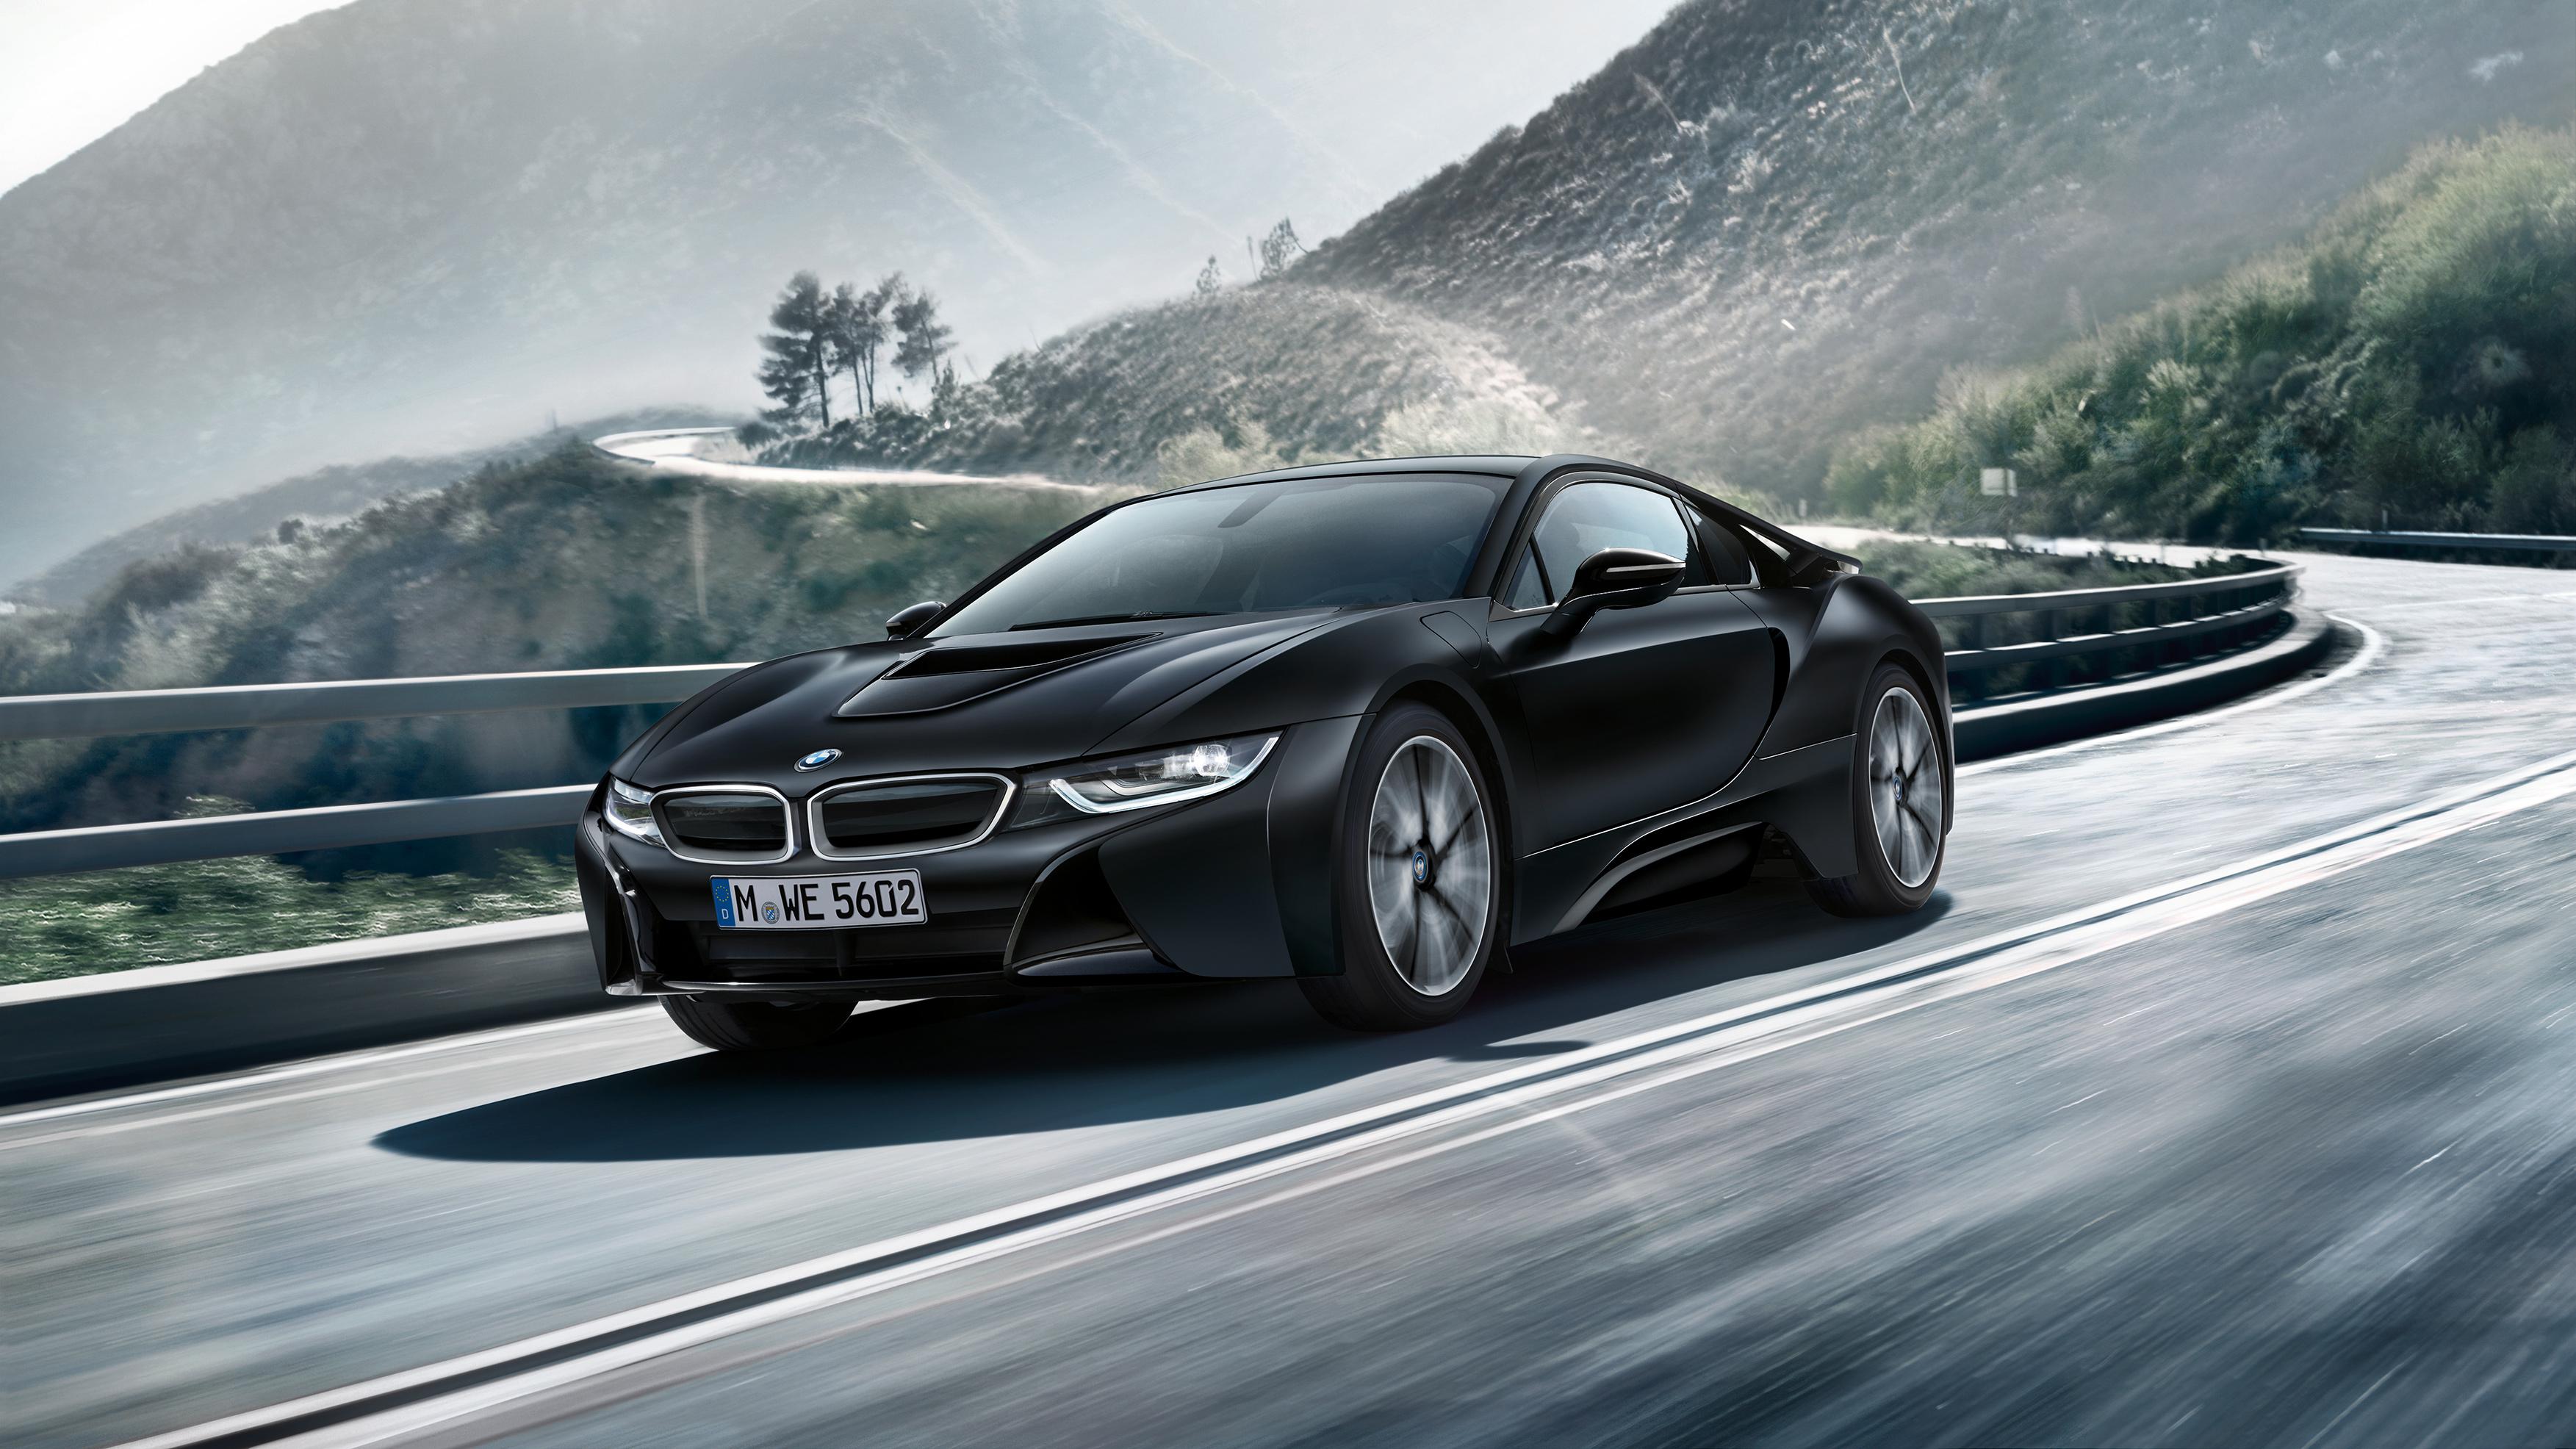 2017 BMW i8 Frozen Black Edition Wallpaper   HD Car ...